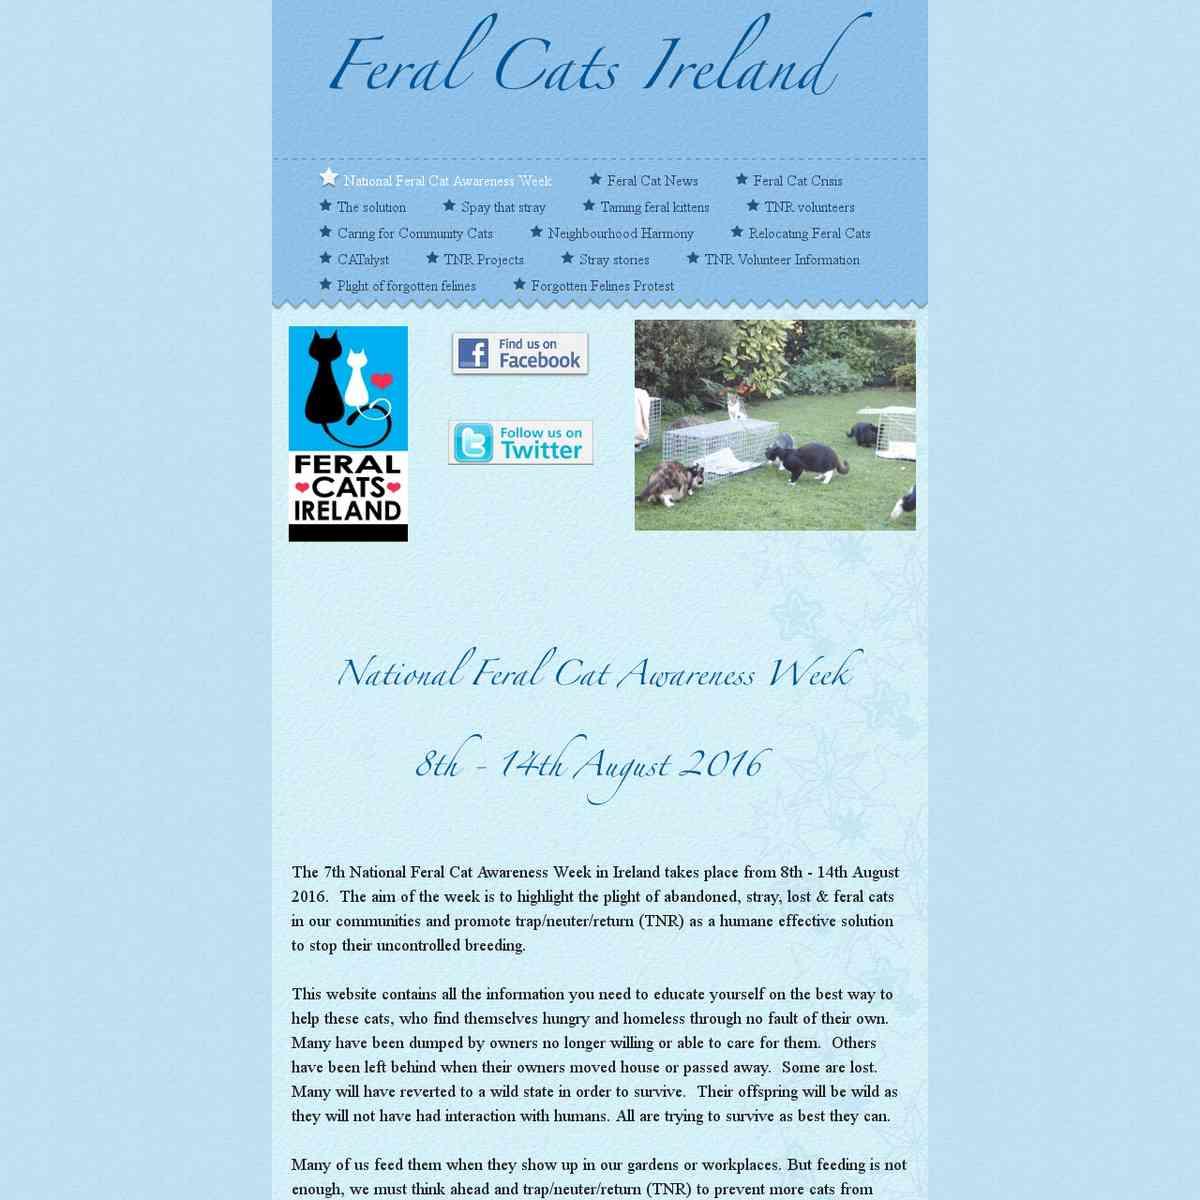 Feral Cats Ireland